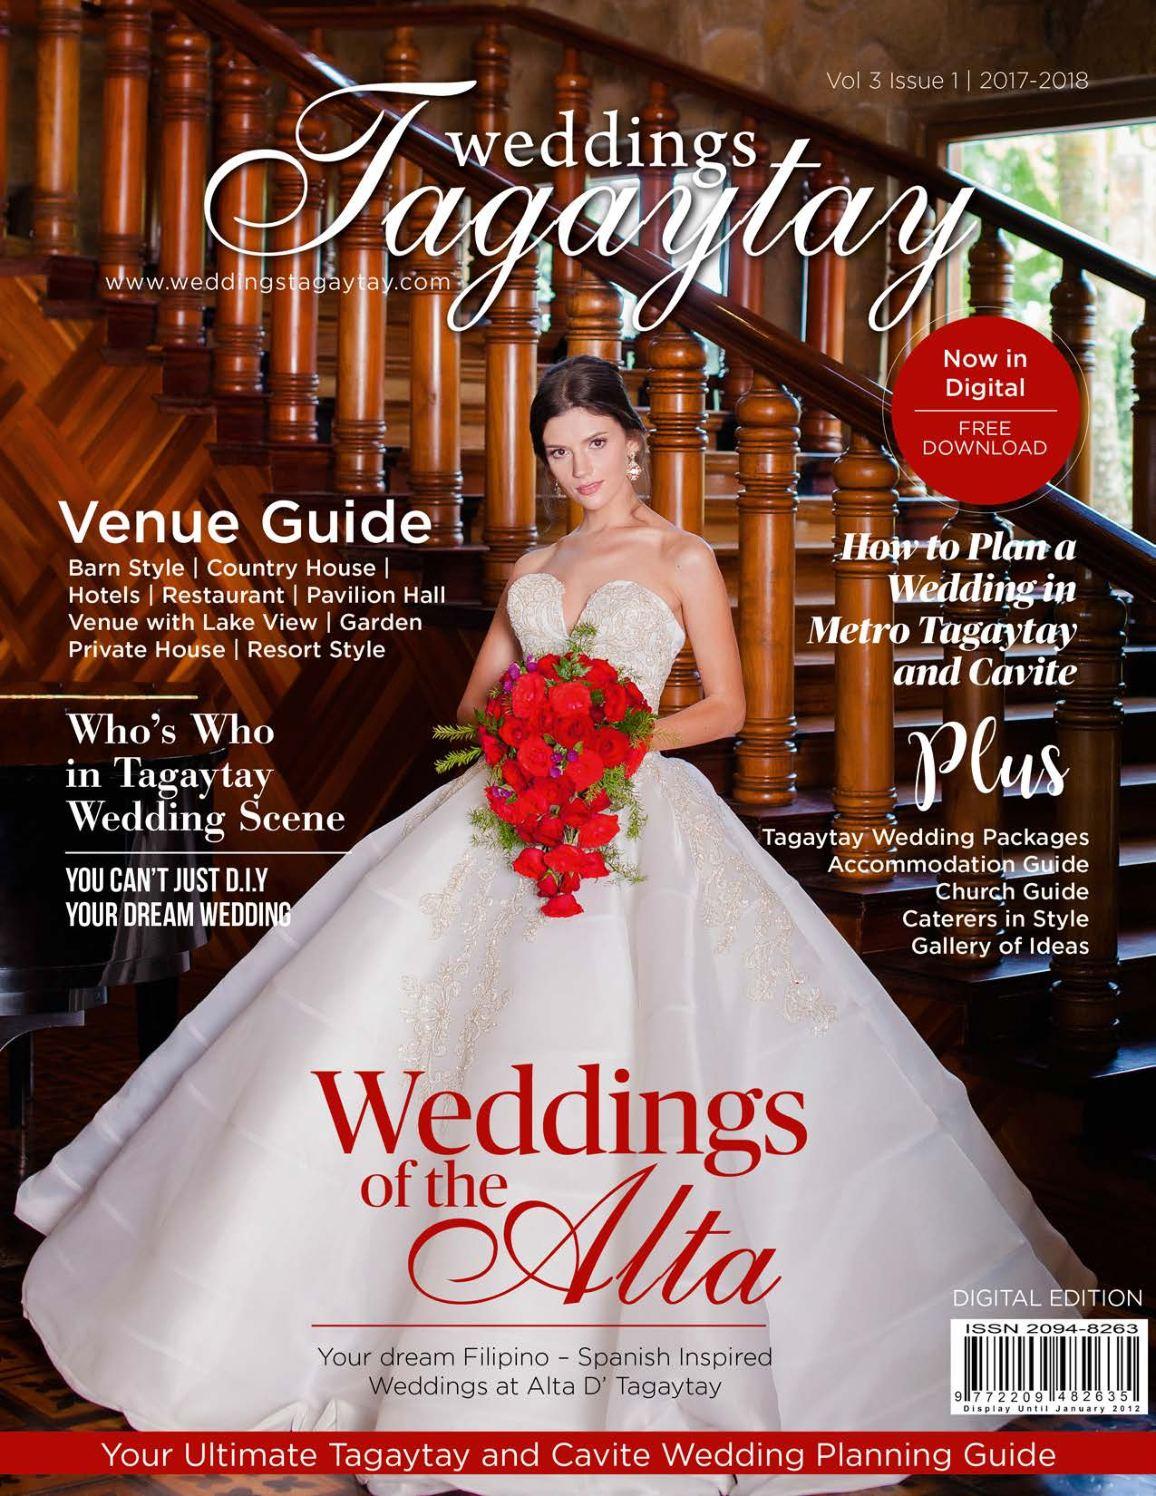 Wedding giveaways for ninongs and ninangs pancit